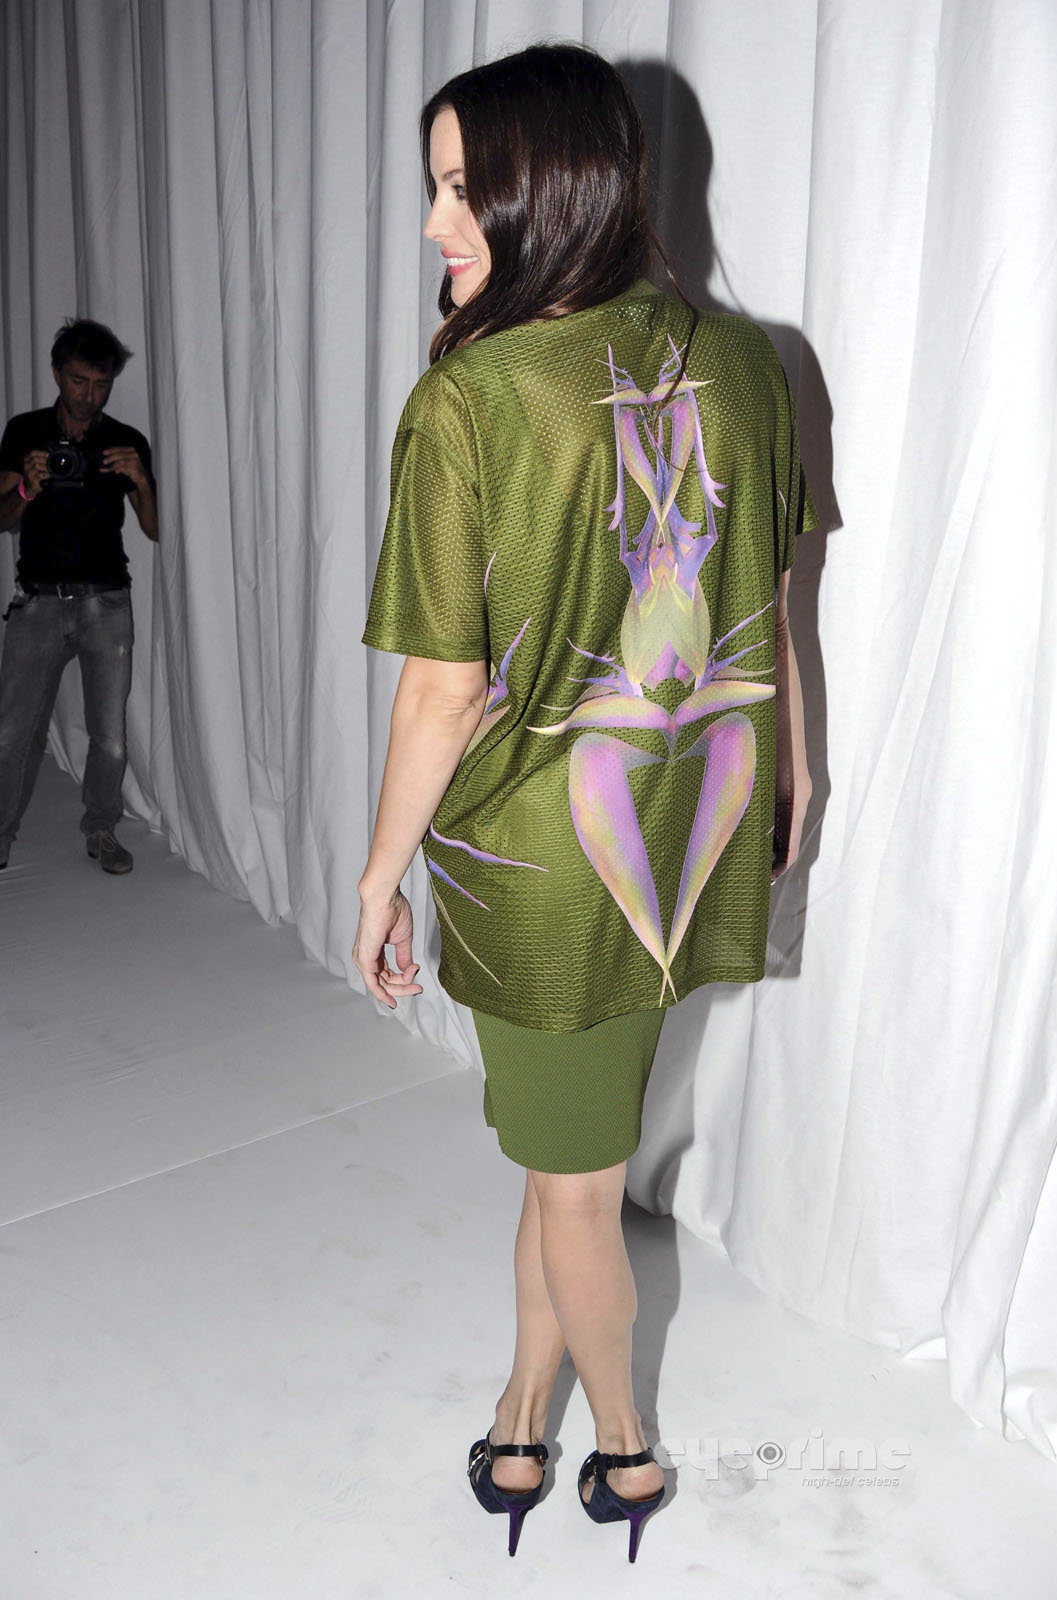 Liv Tyler: Givenchy প্রদর্শনী during Paris Fashion Week, Oct 2